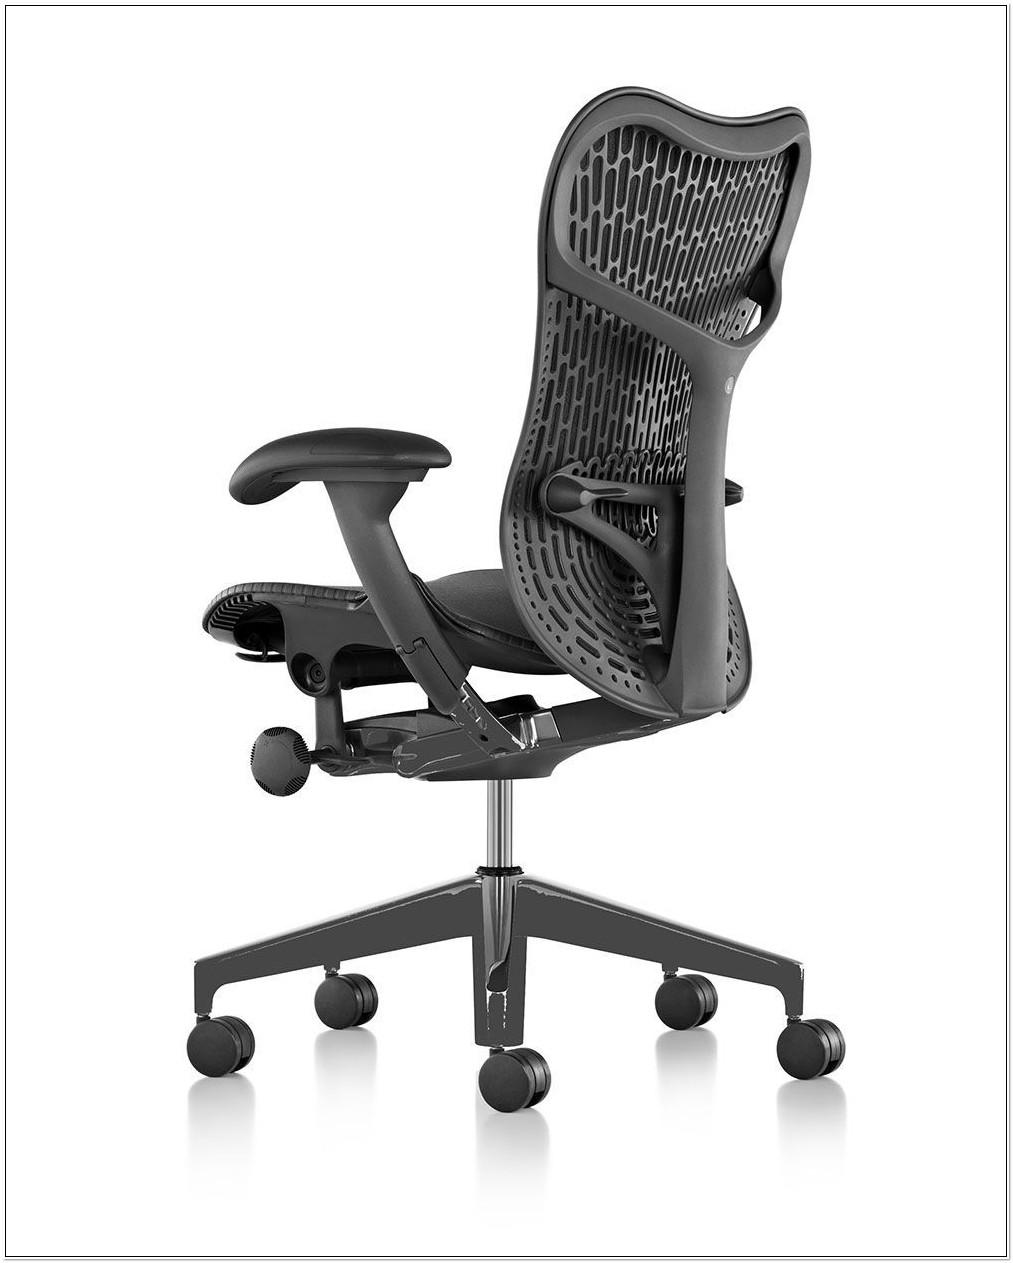 Mirra Chair Highly Adjustable By Herman Miller